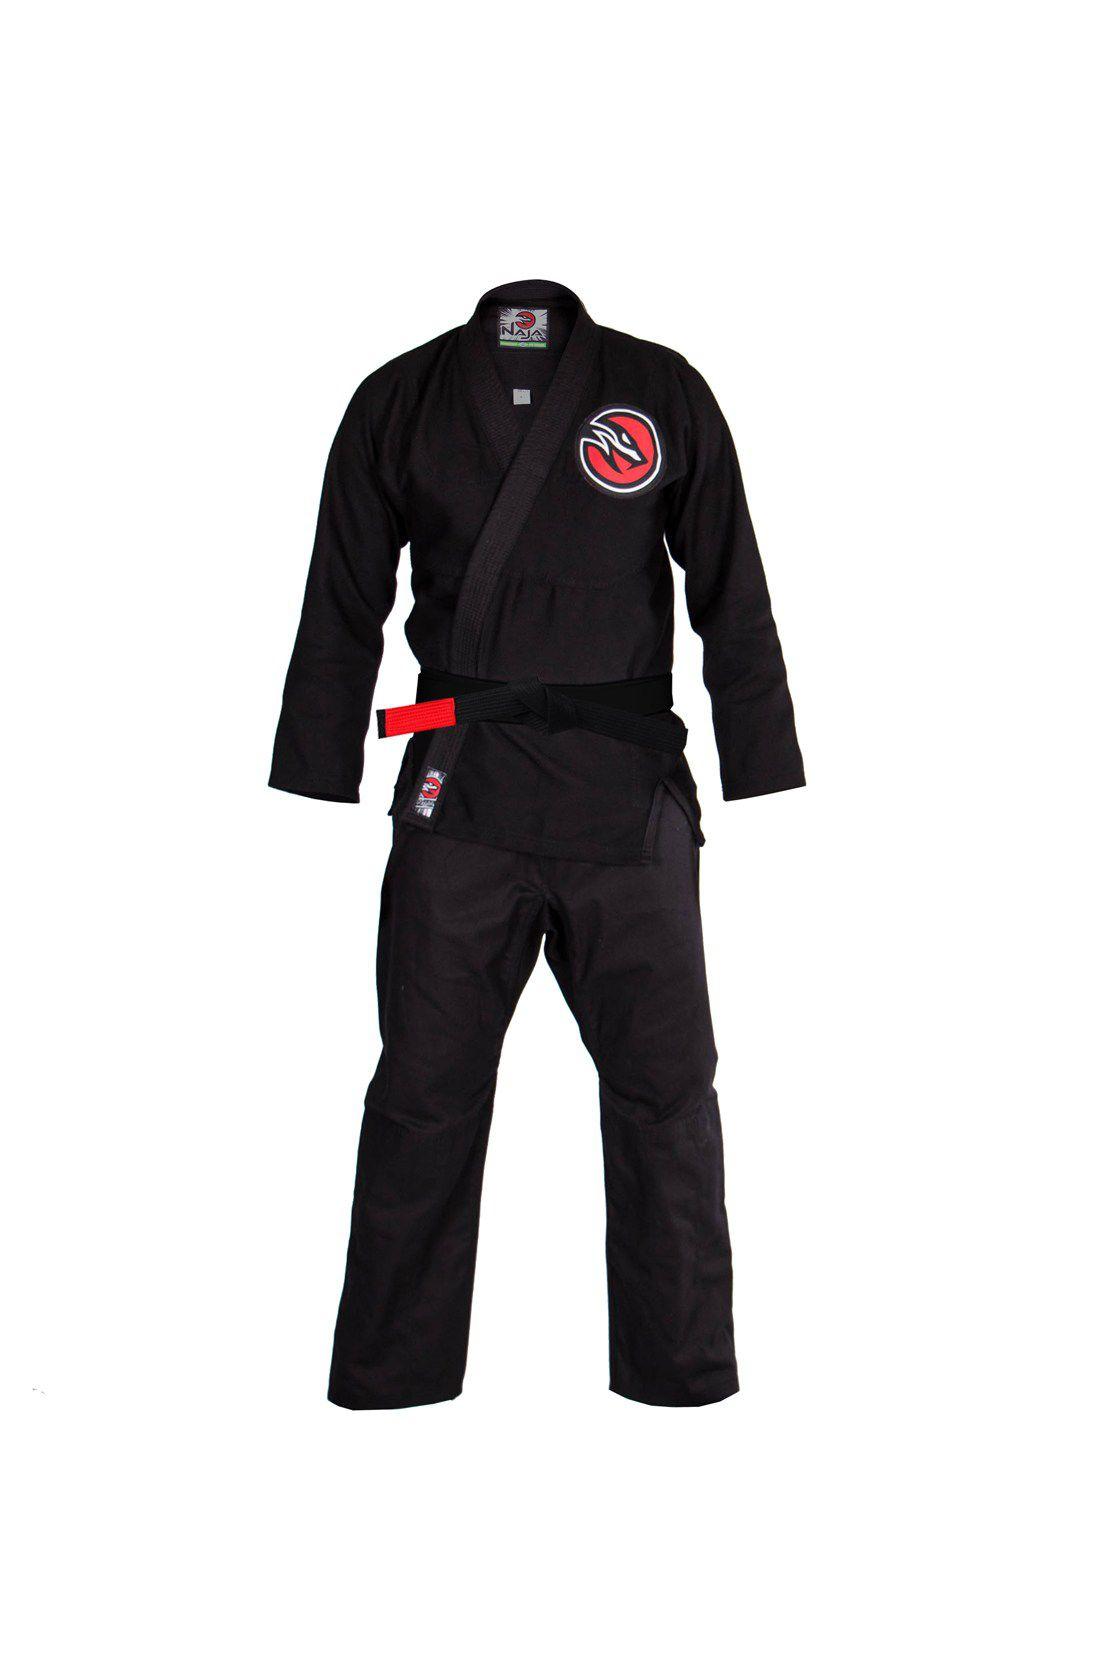 Kimono JIu Jitsu Naja New First Trançado Leve - OPP - Preto  - Loja do Competidor